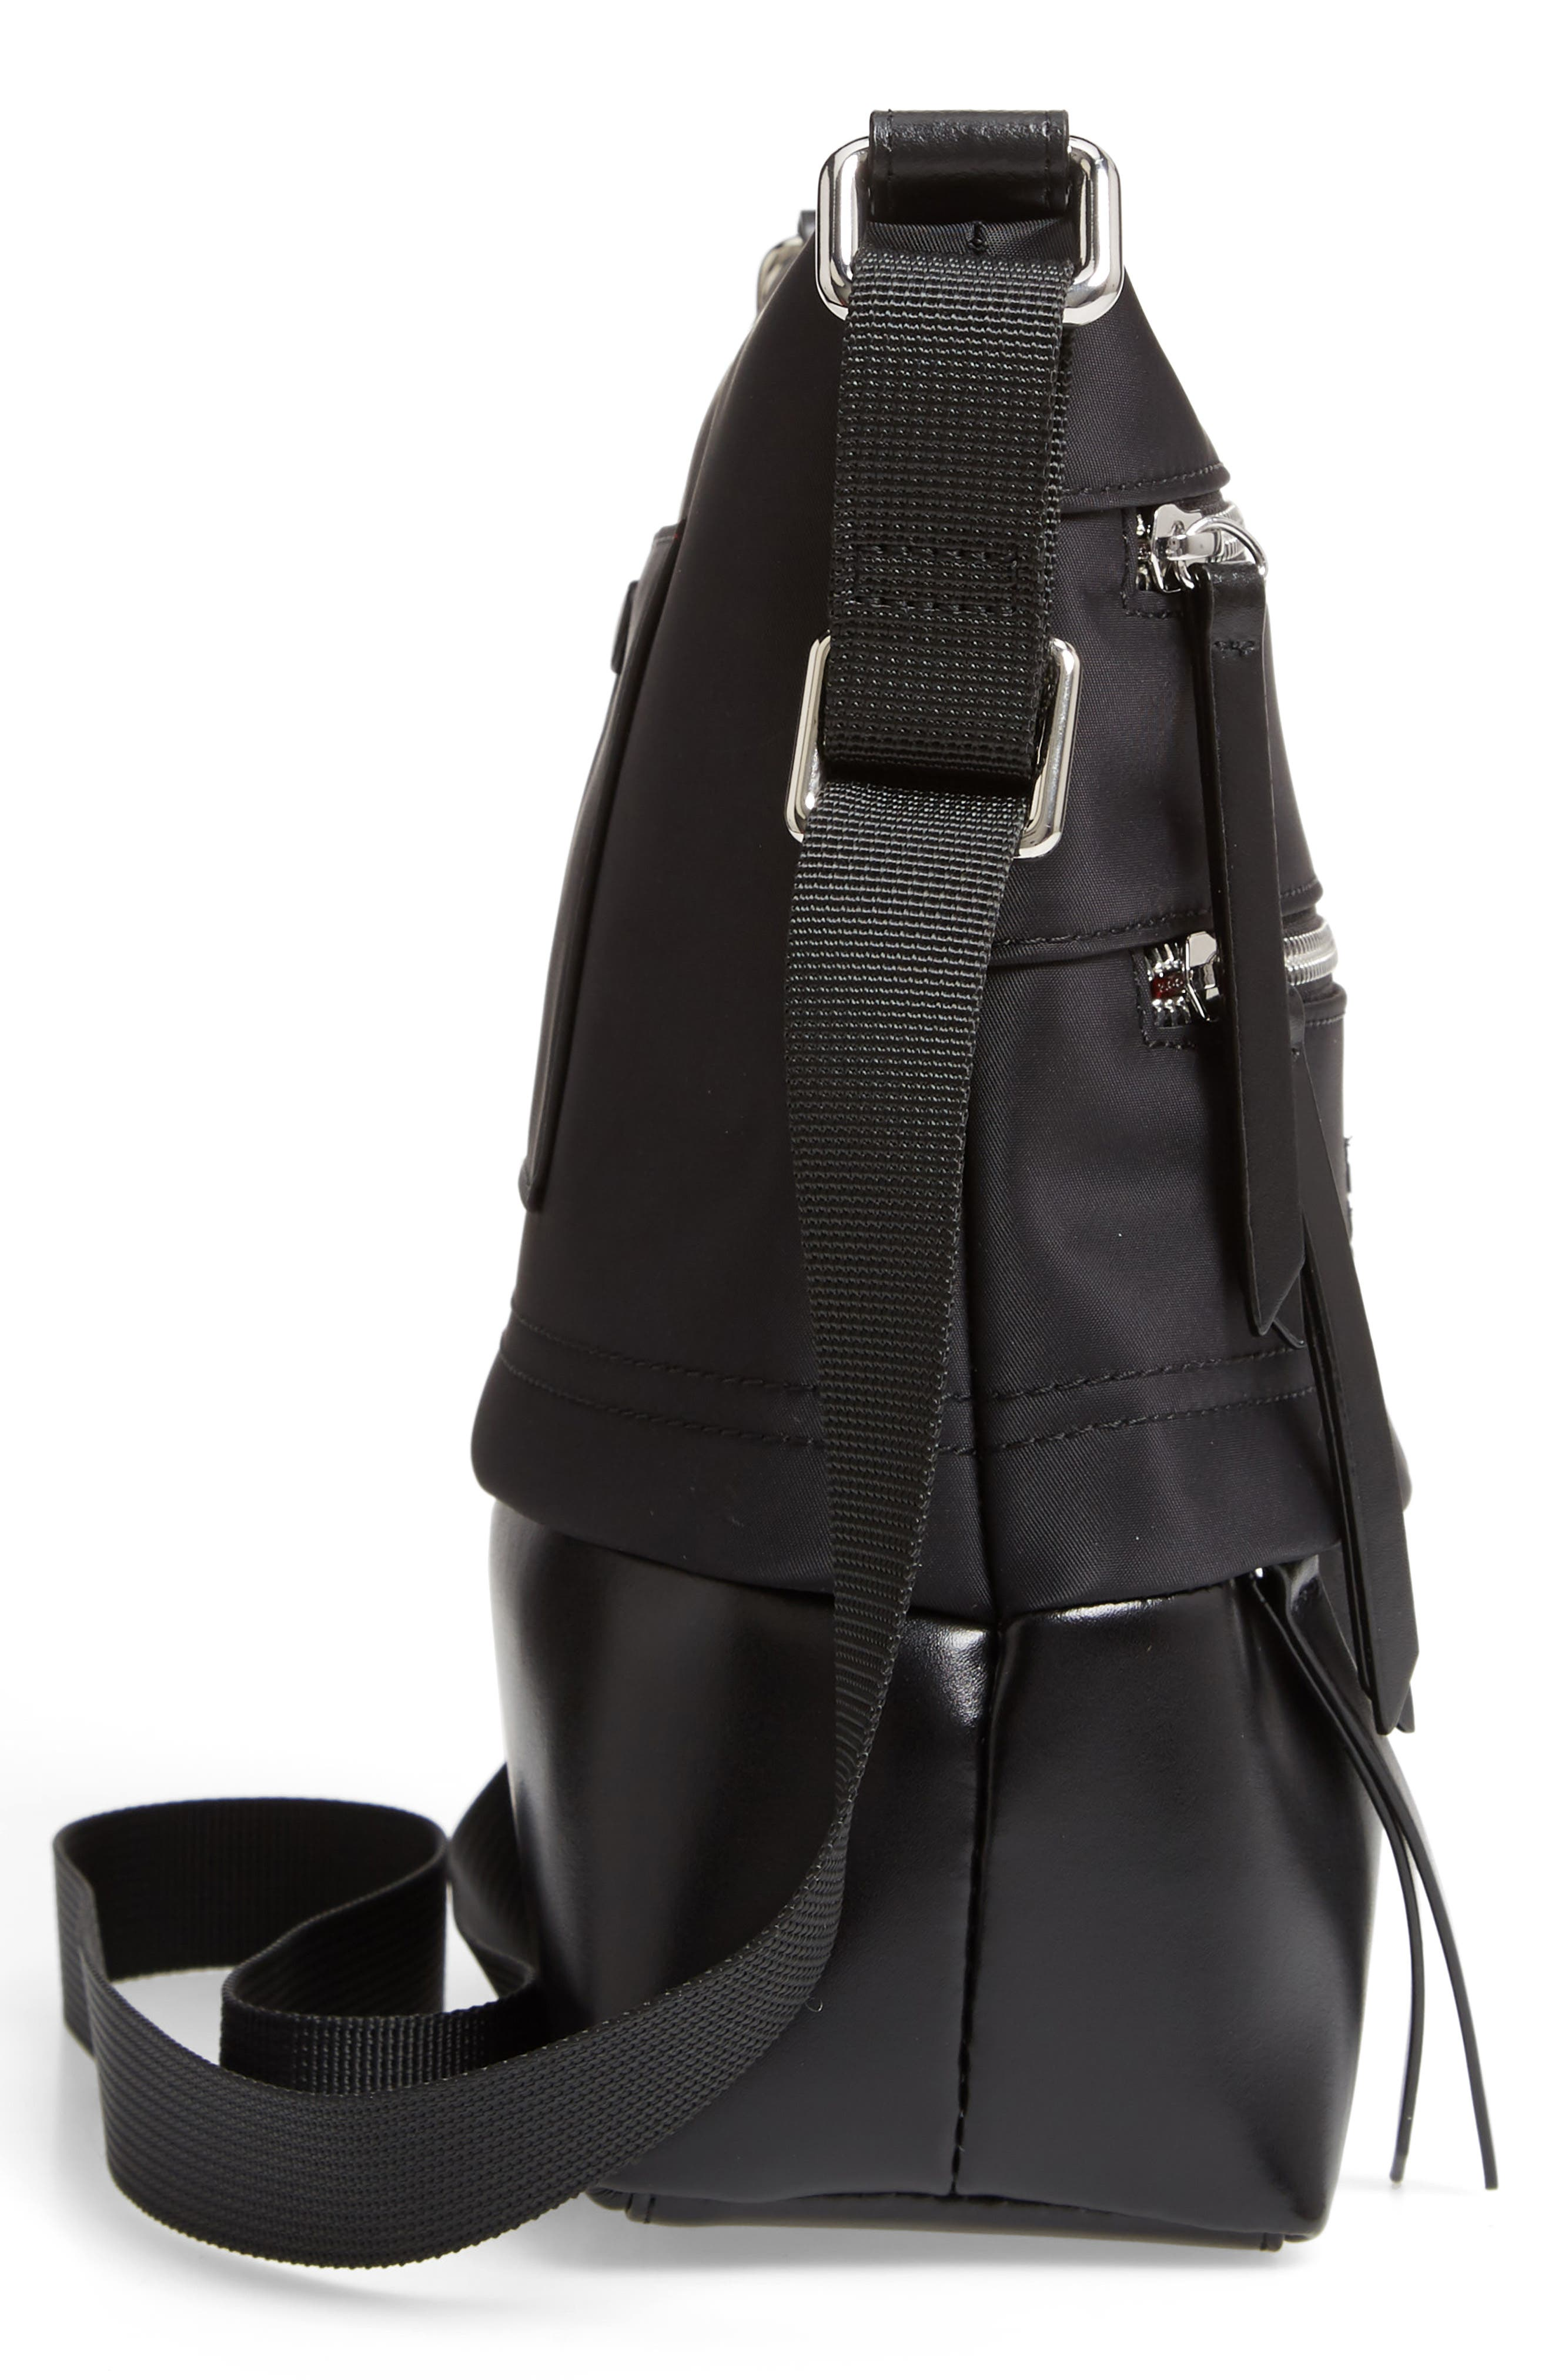 Wanda Nylon Sport RFID Travel Crossbody Bag,                             Alternate thumbnail 5, color,                             BLACK